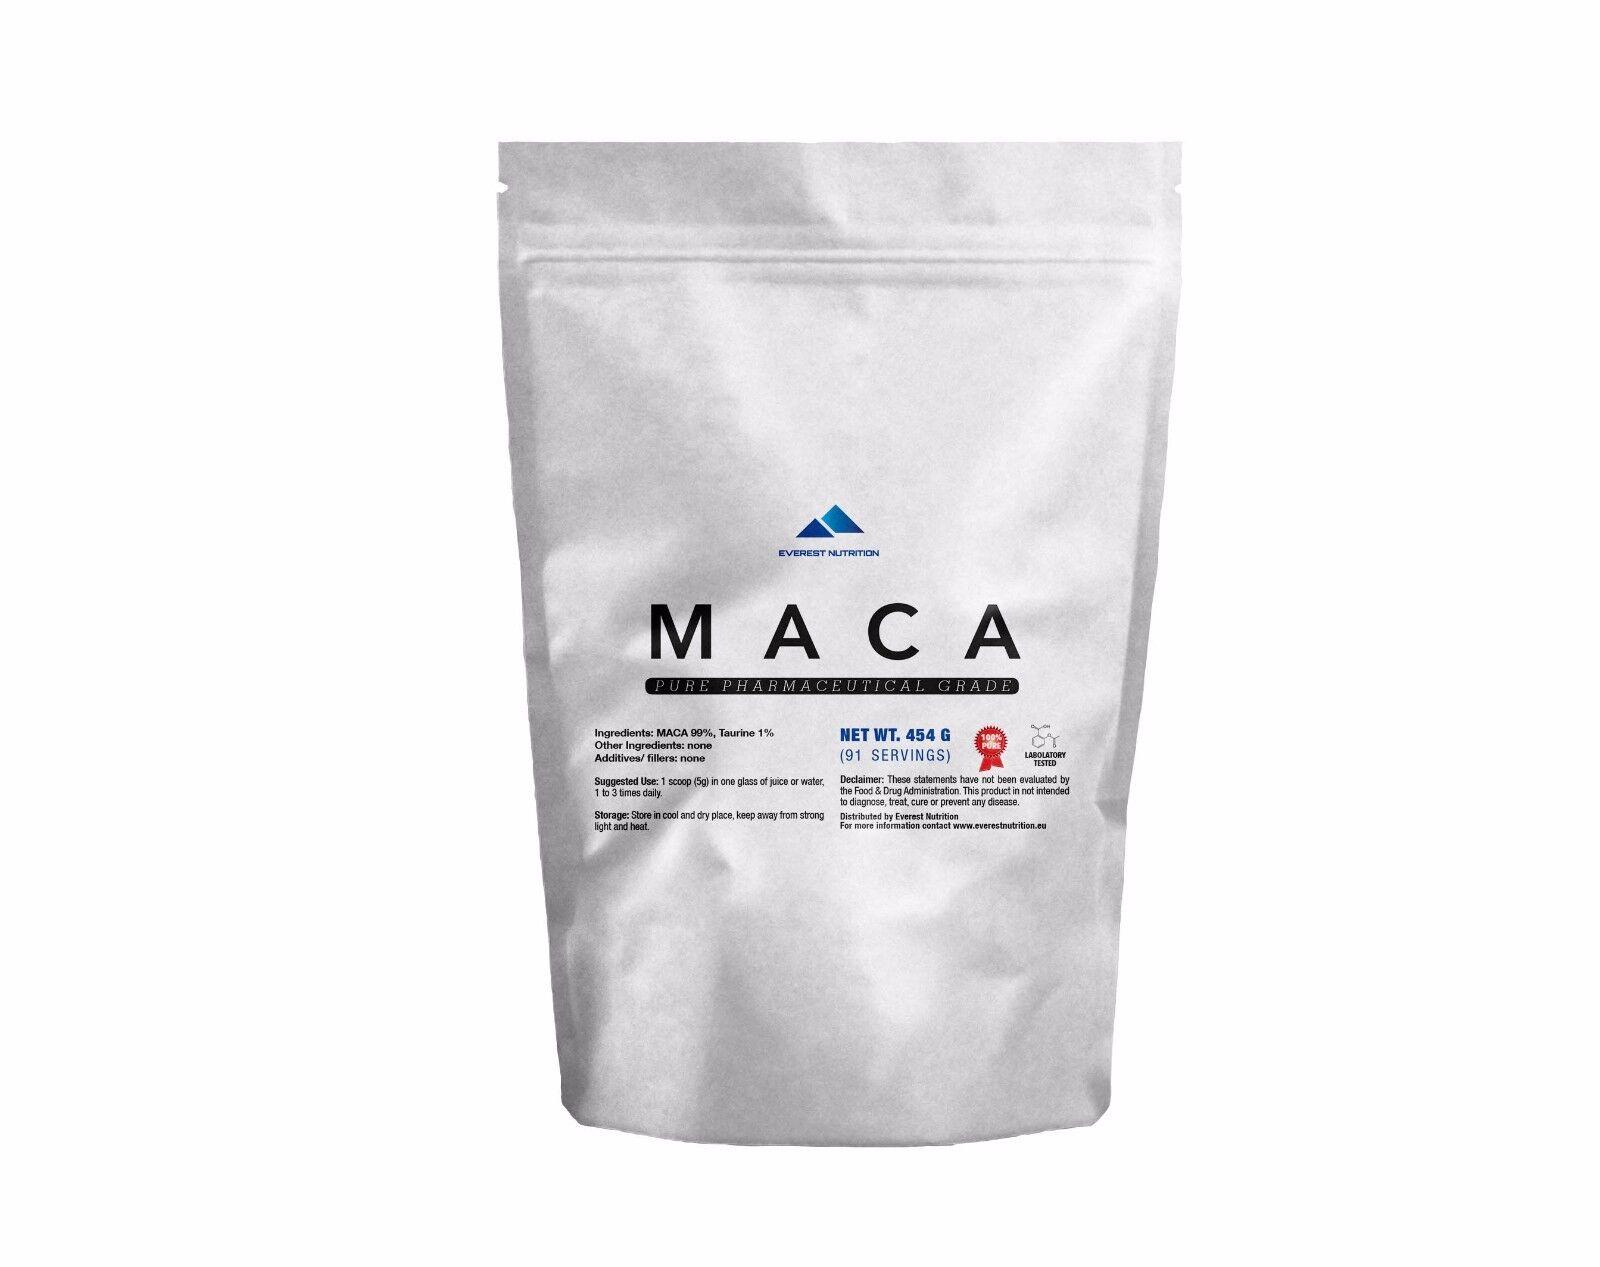 MACA Lepidium meyenii 100% PURE ORGANIC POWDER SUPERFOODS